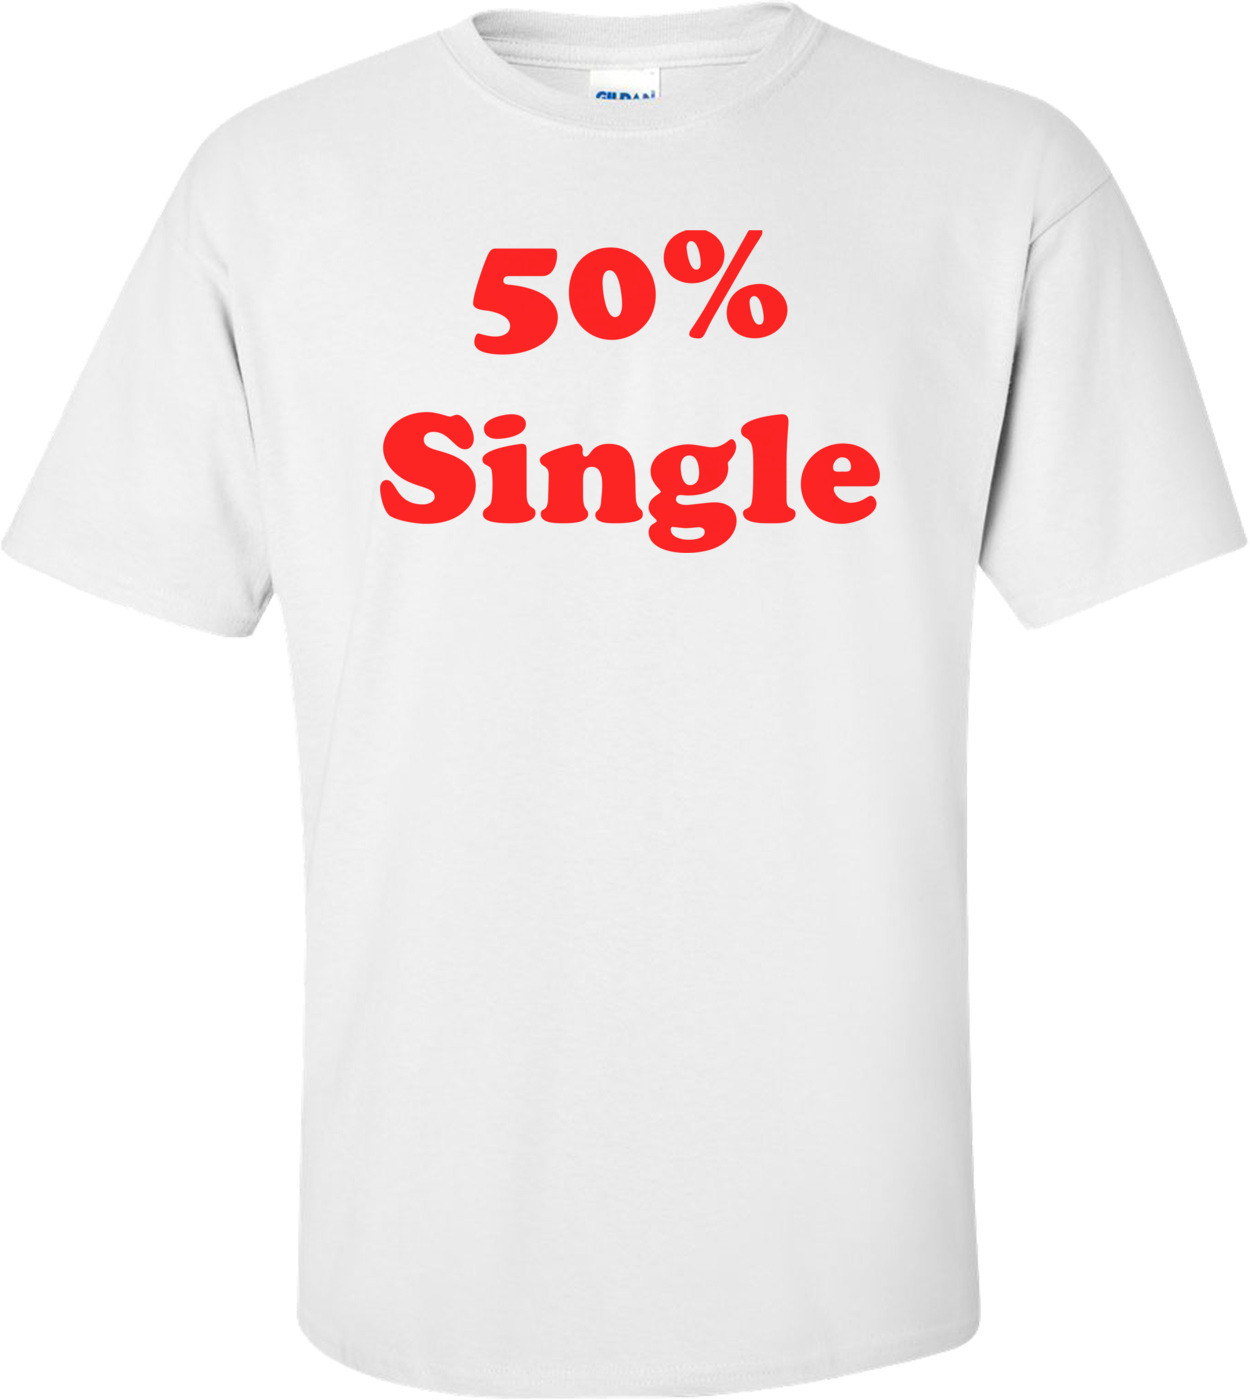 50% Single Shirt